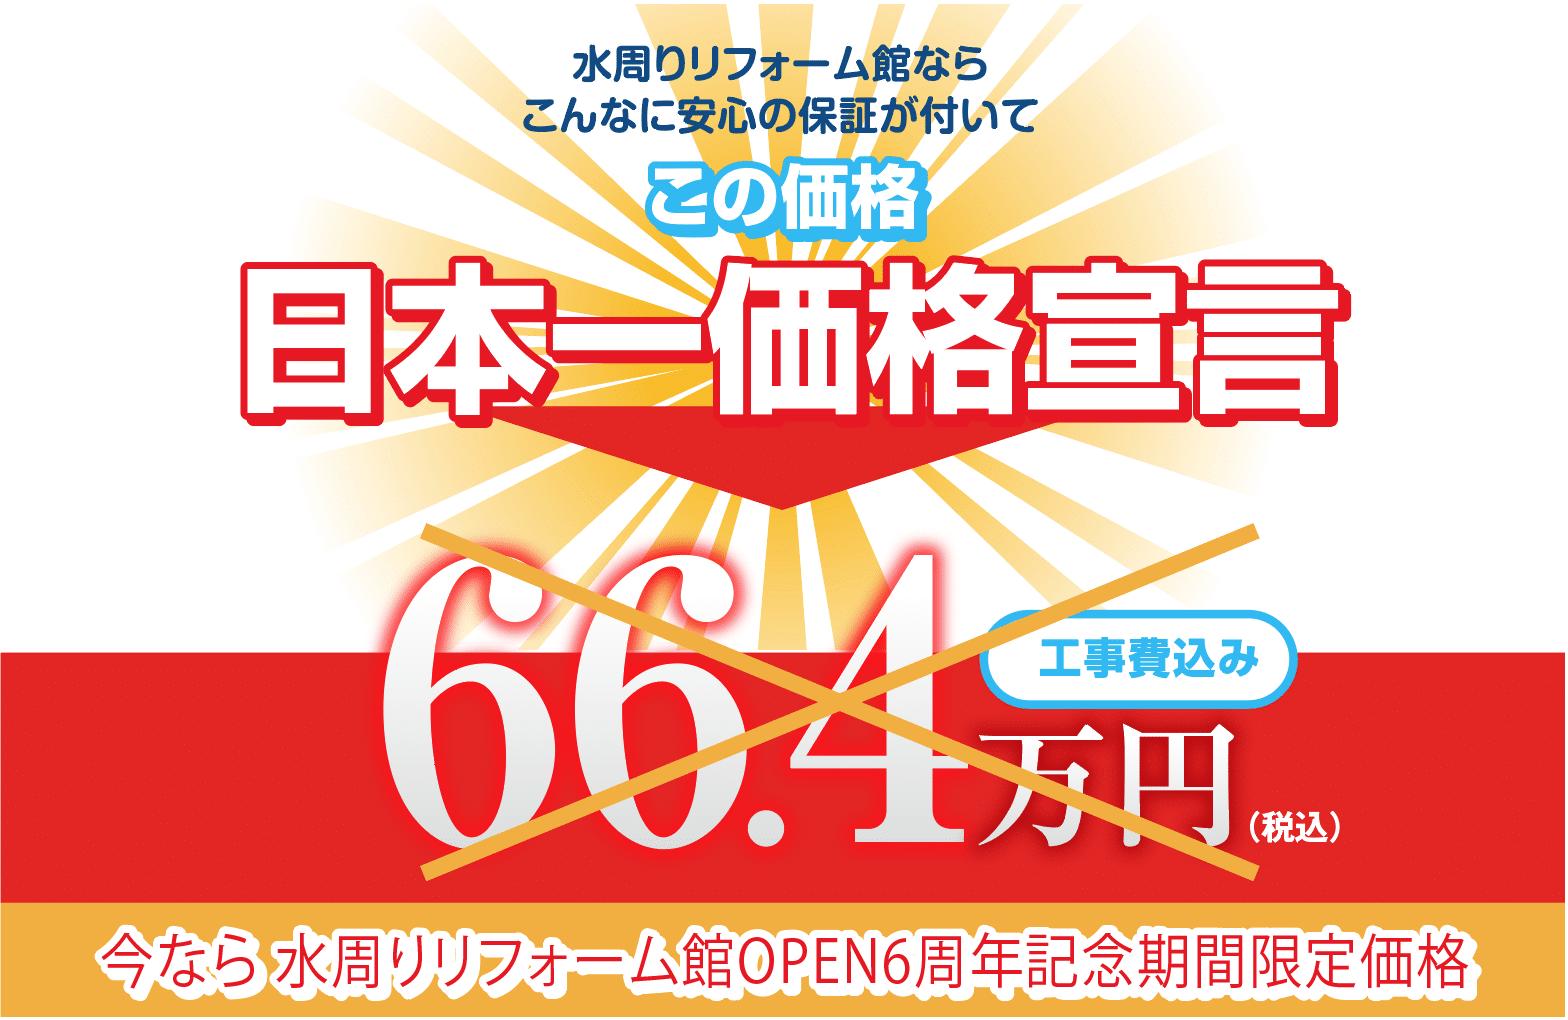 TOCLASキッチンが日本一価格宣言